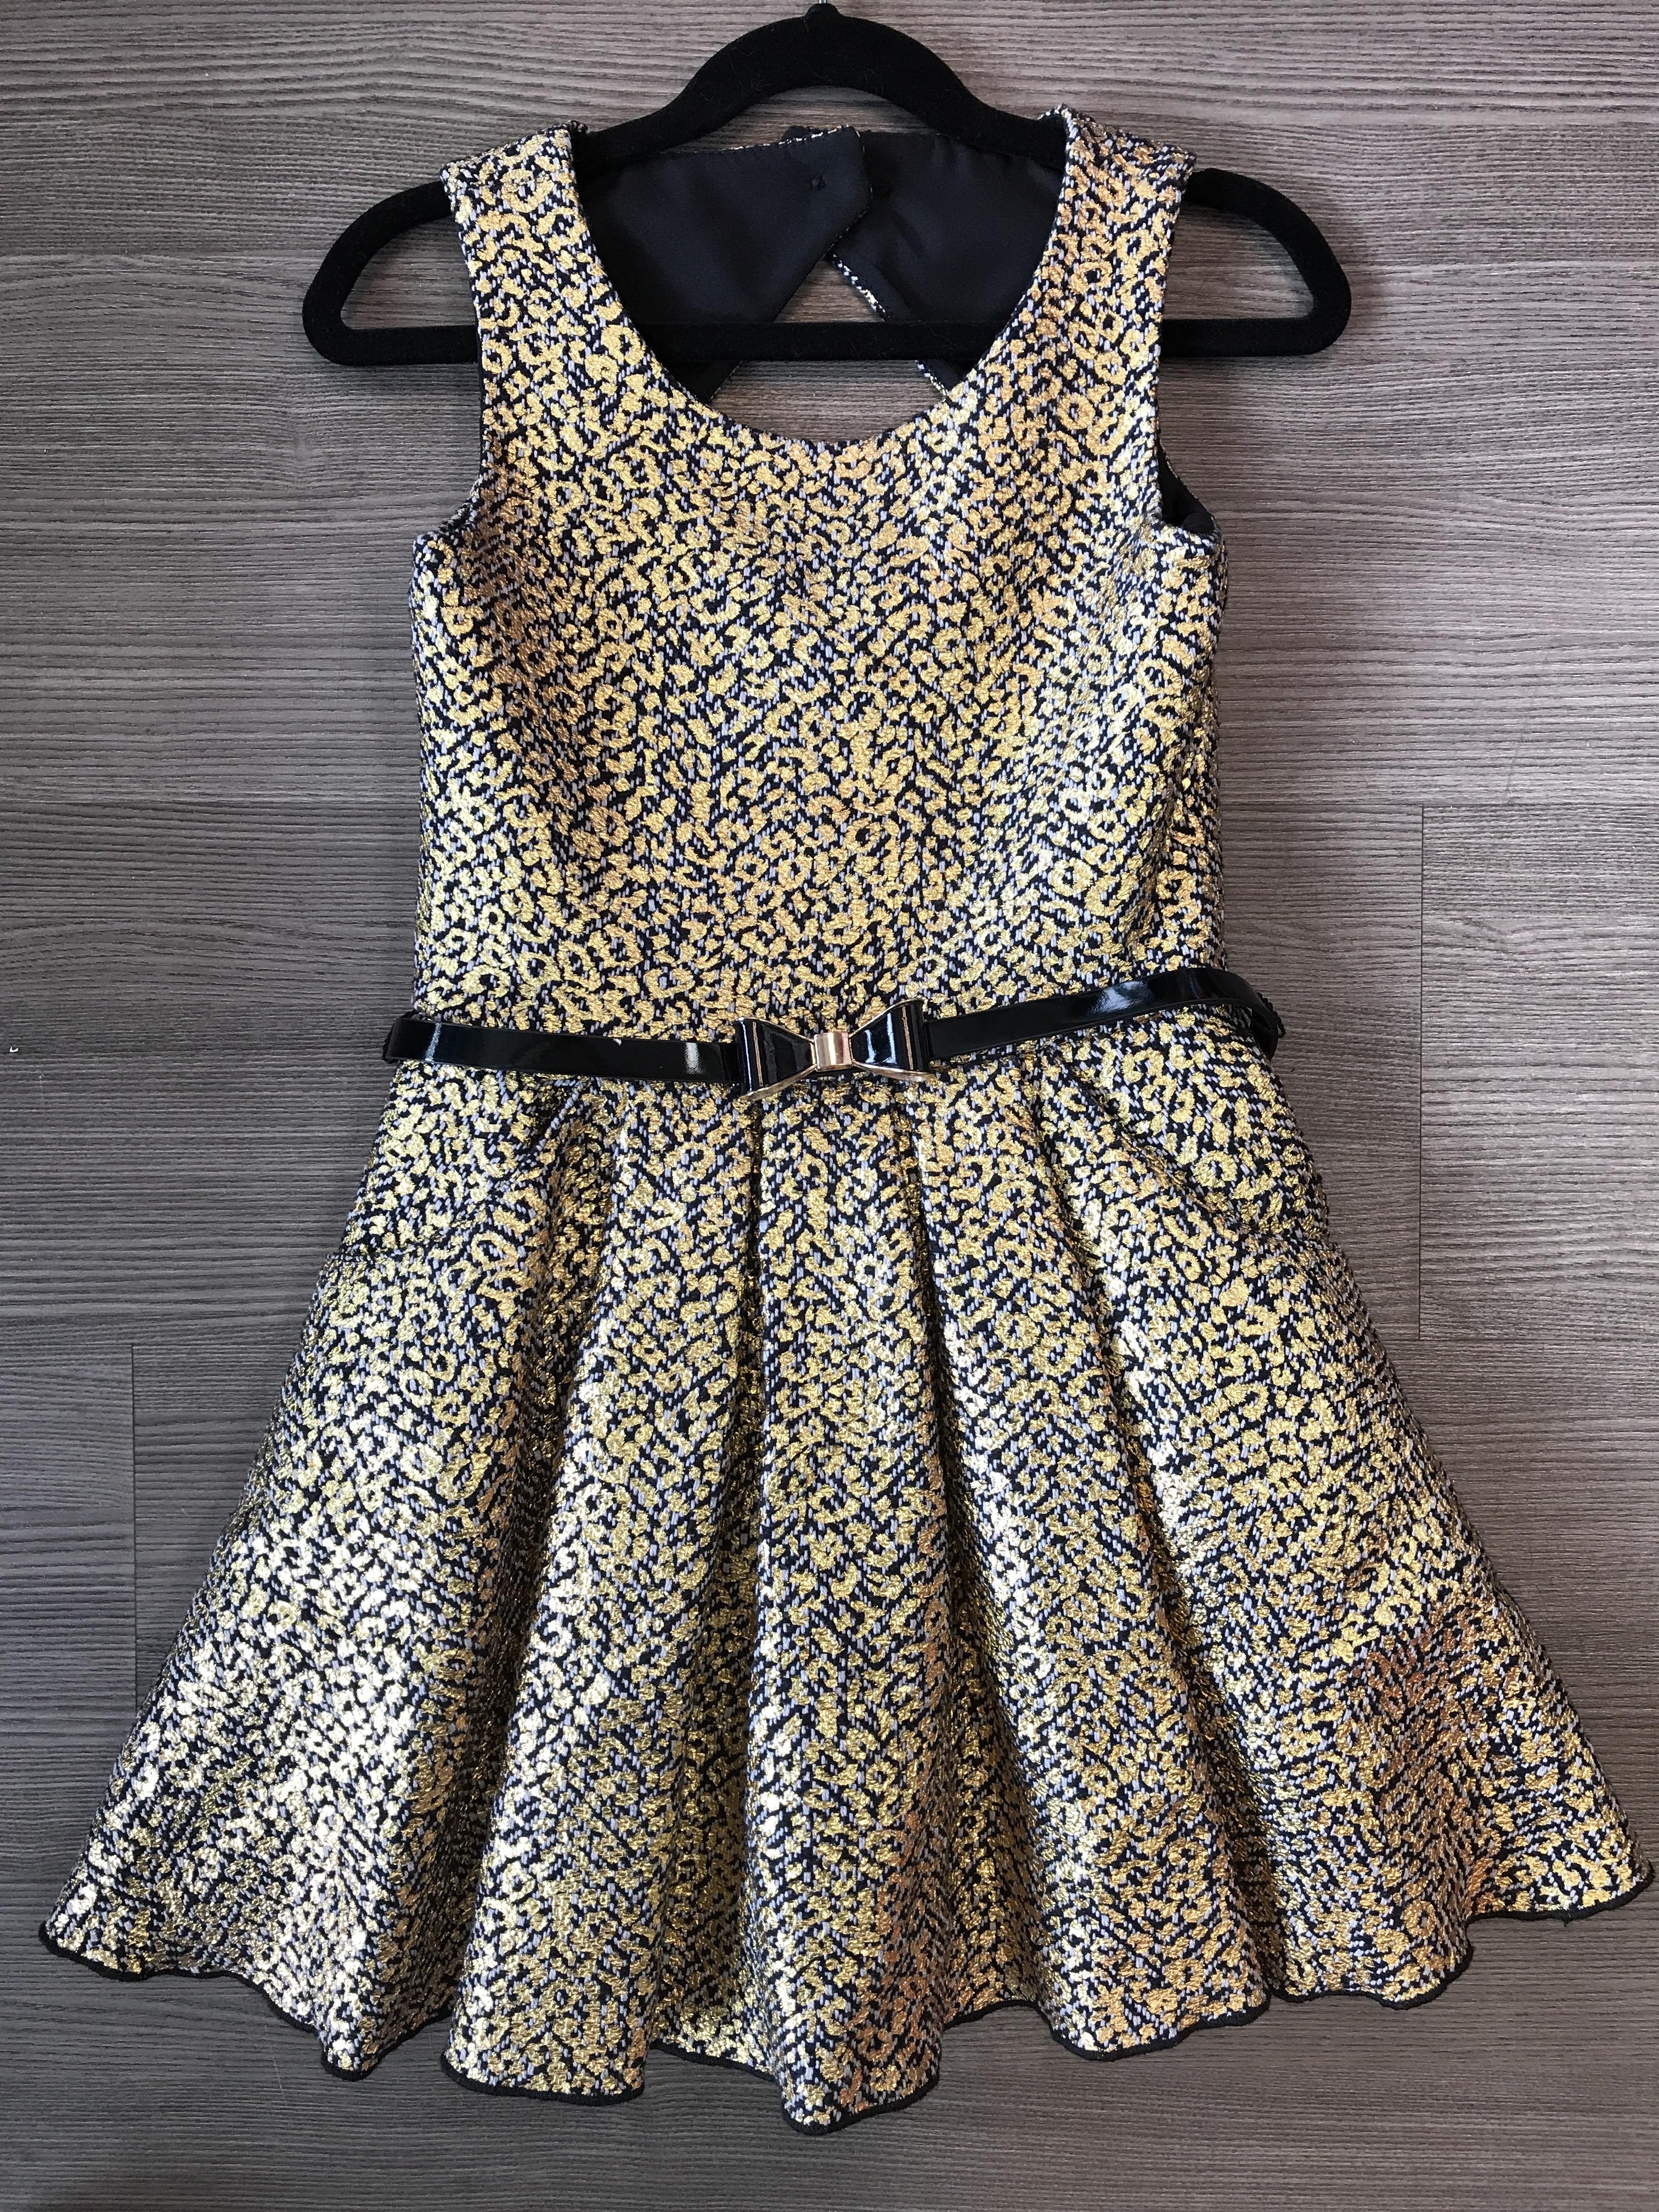 Zoe-Size-7-Gold-Dress_9441A.jpg